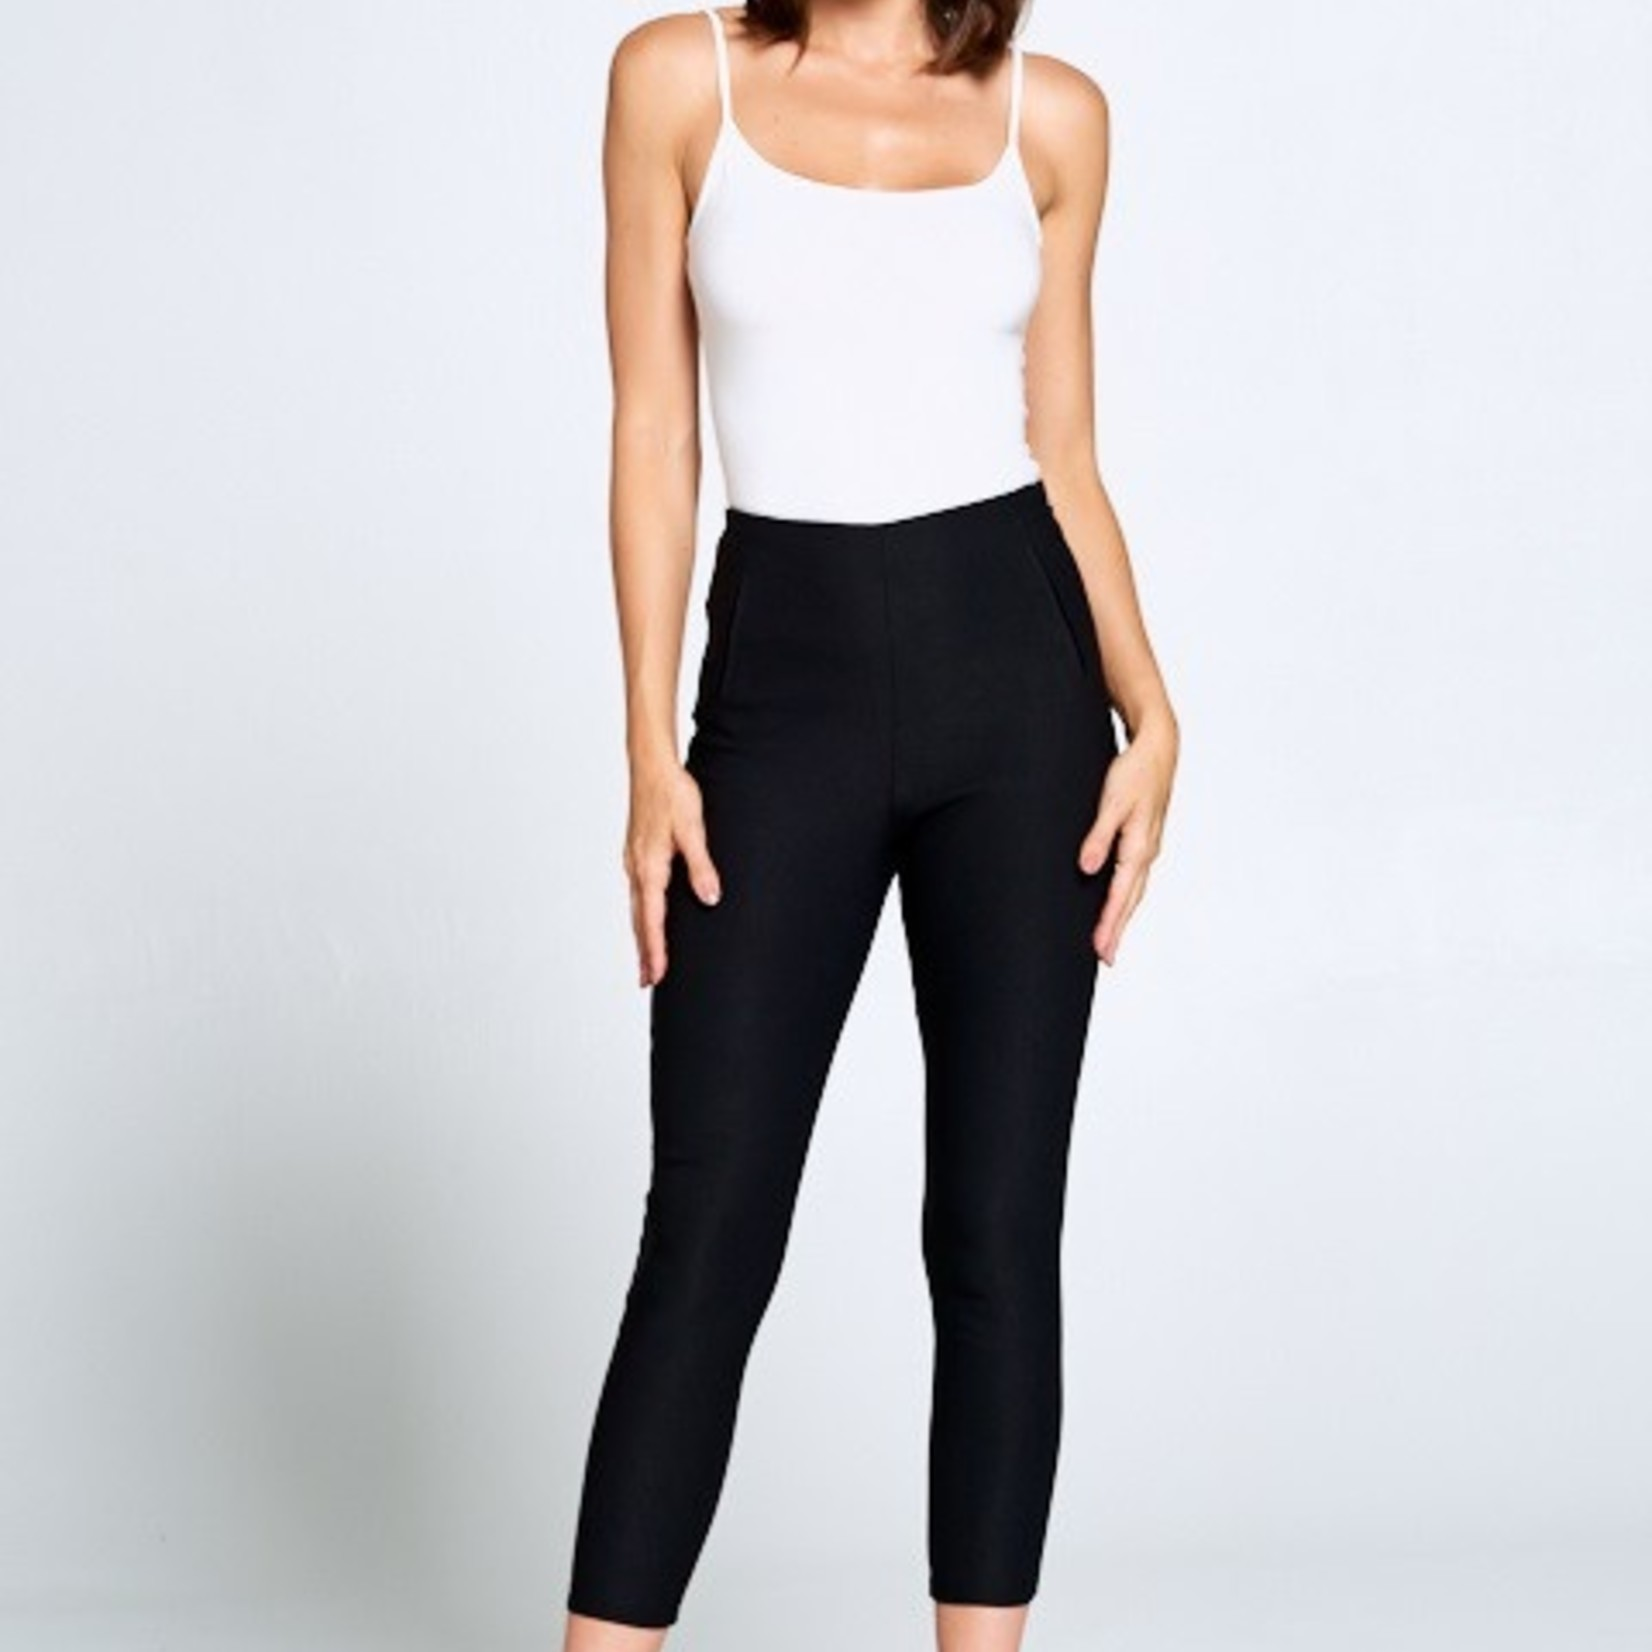 clara stretch dress pants